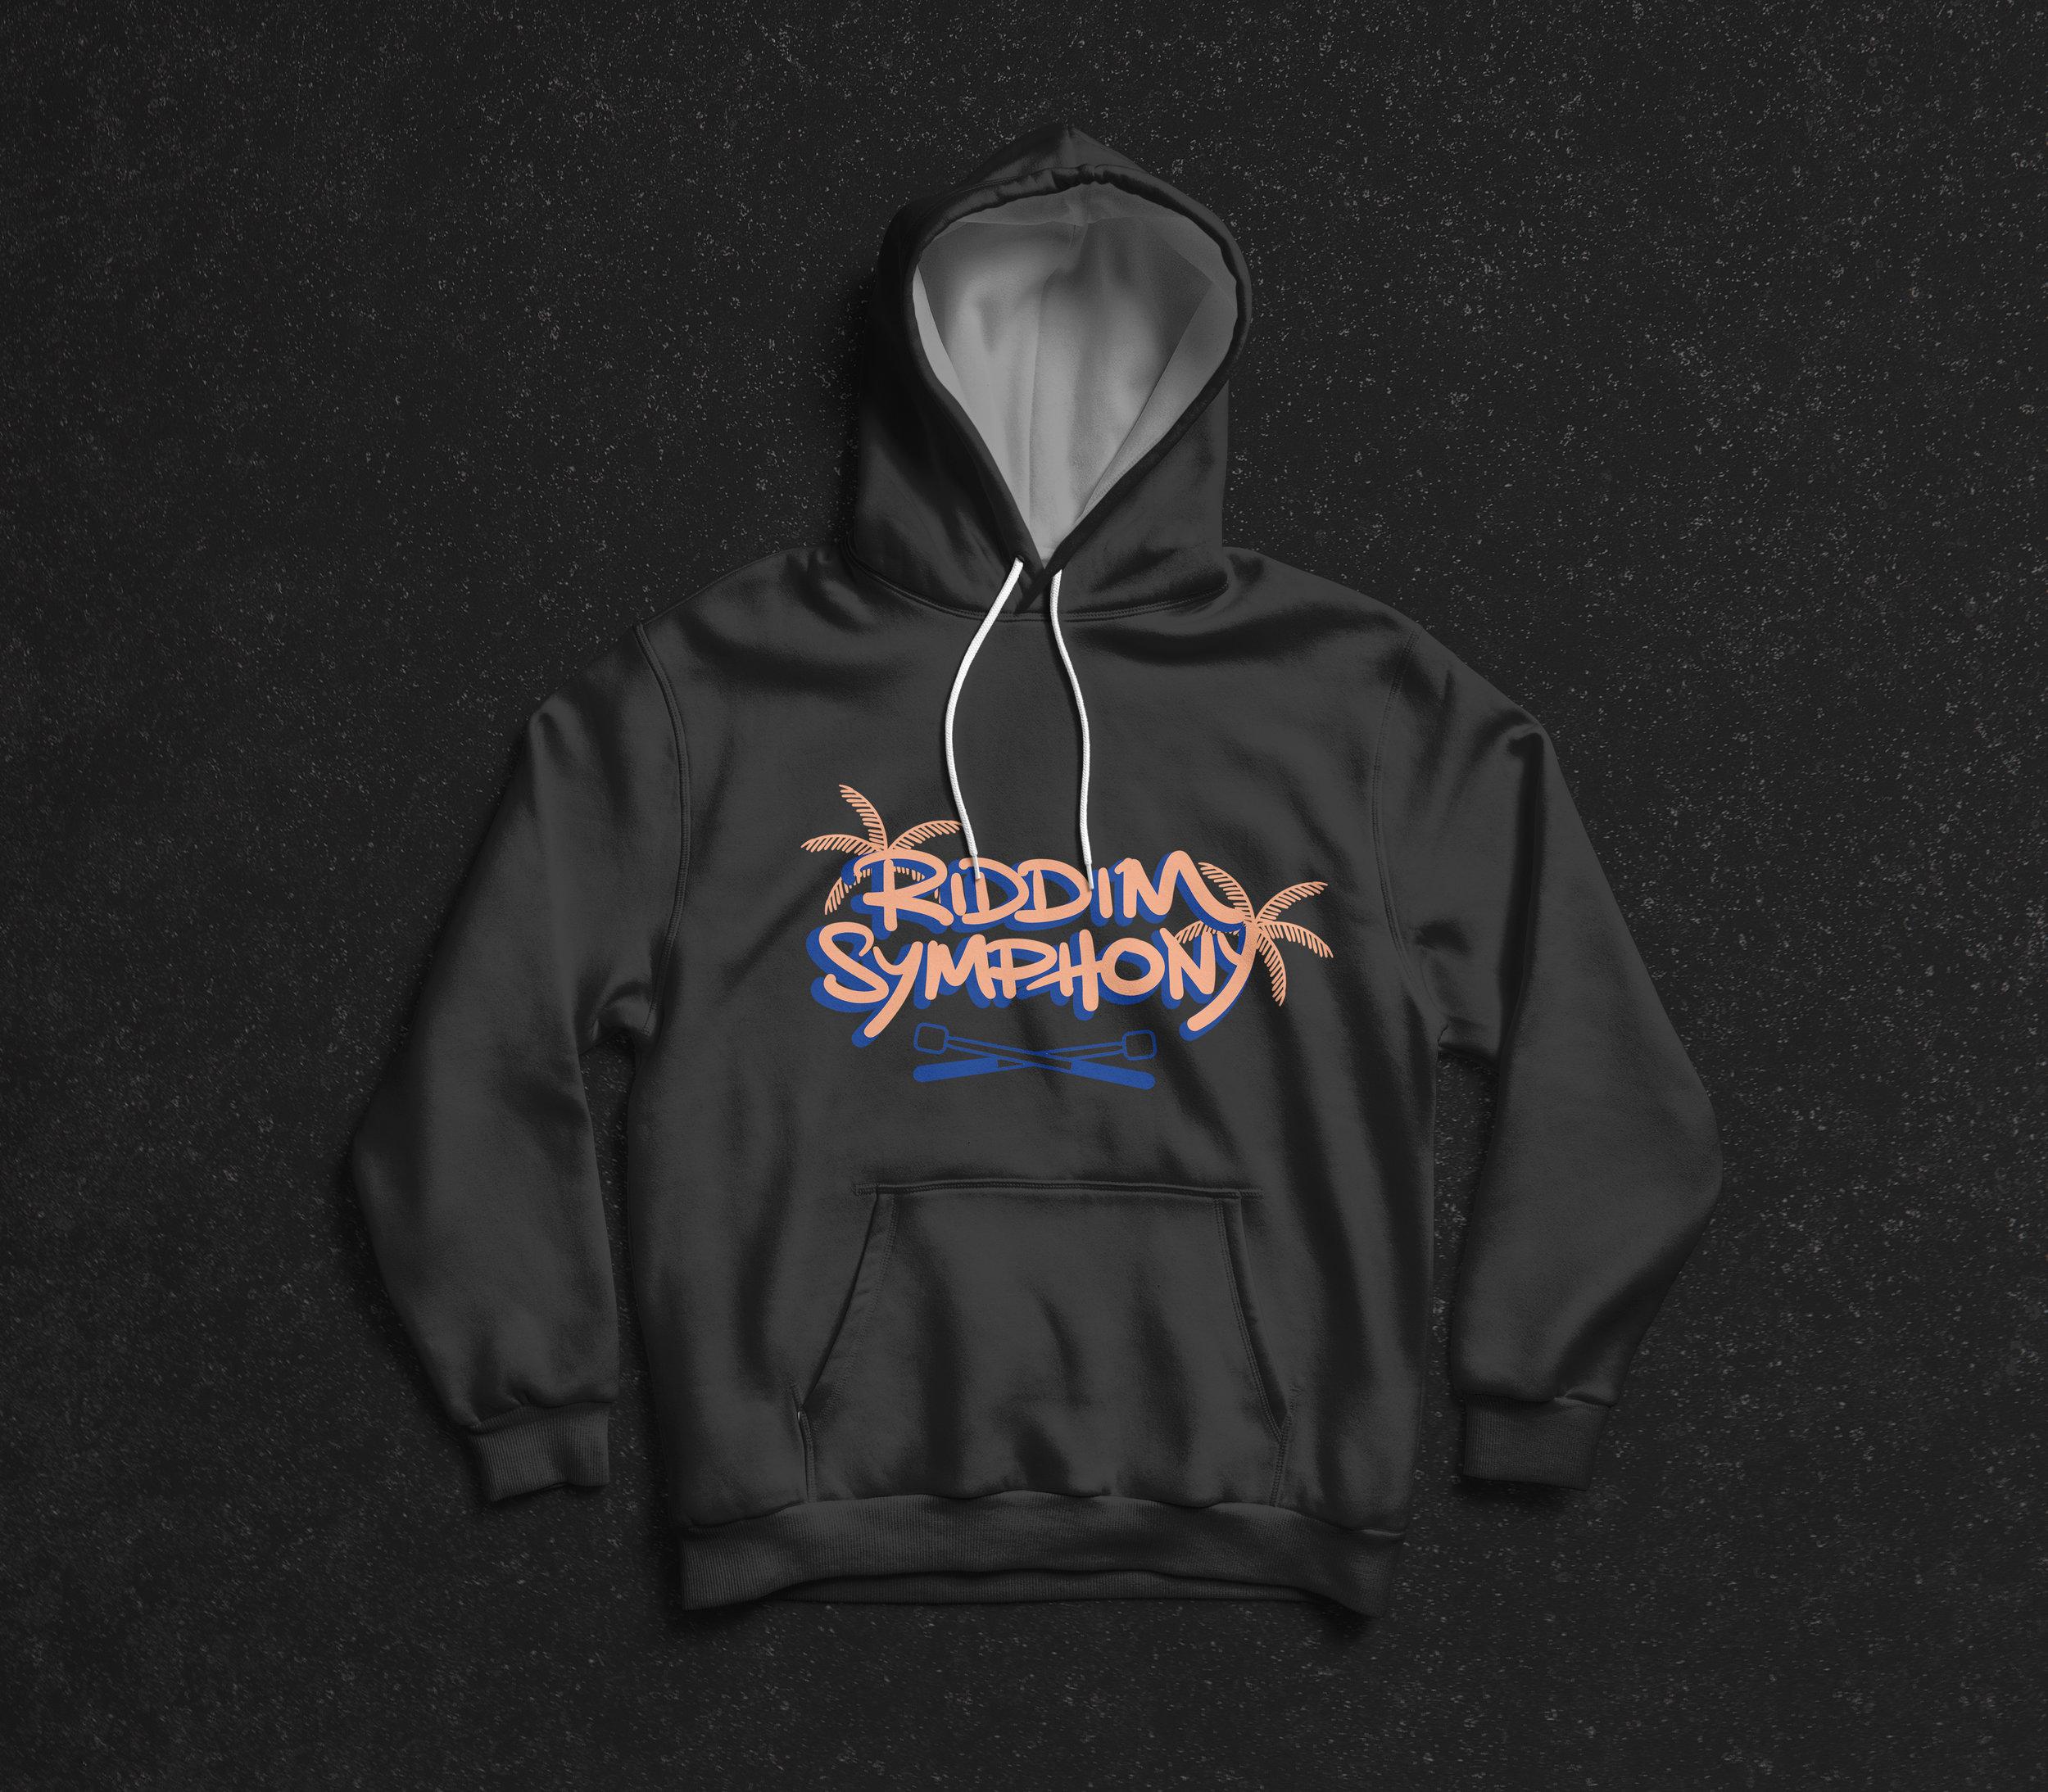 Riddim-Symphony-hoodie-mockup.jpg